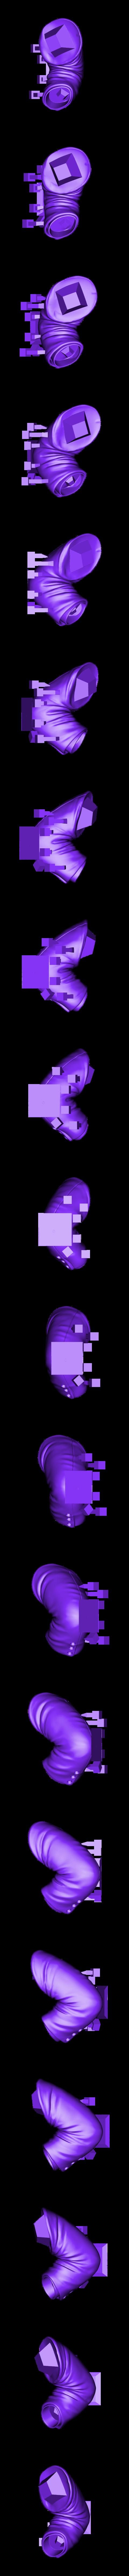 Sleeve_left.stl Download free STL file Bold Machines: Mr. Walthersnap • 3D print design, boldmachines